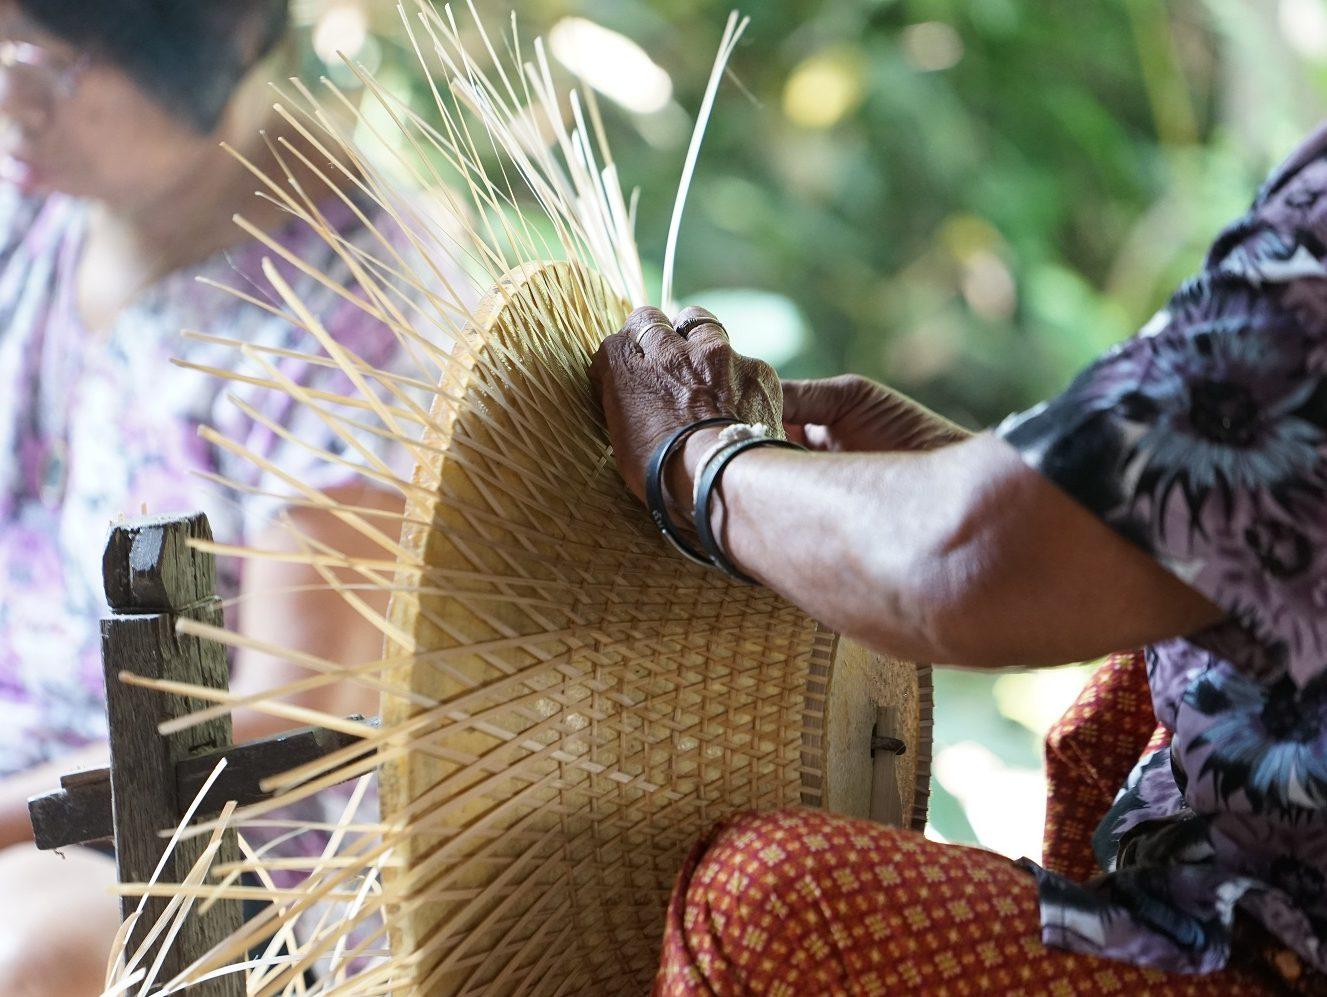 handcrafting straw hats